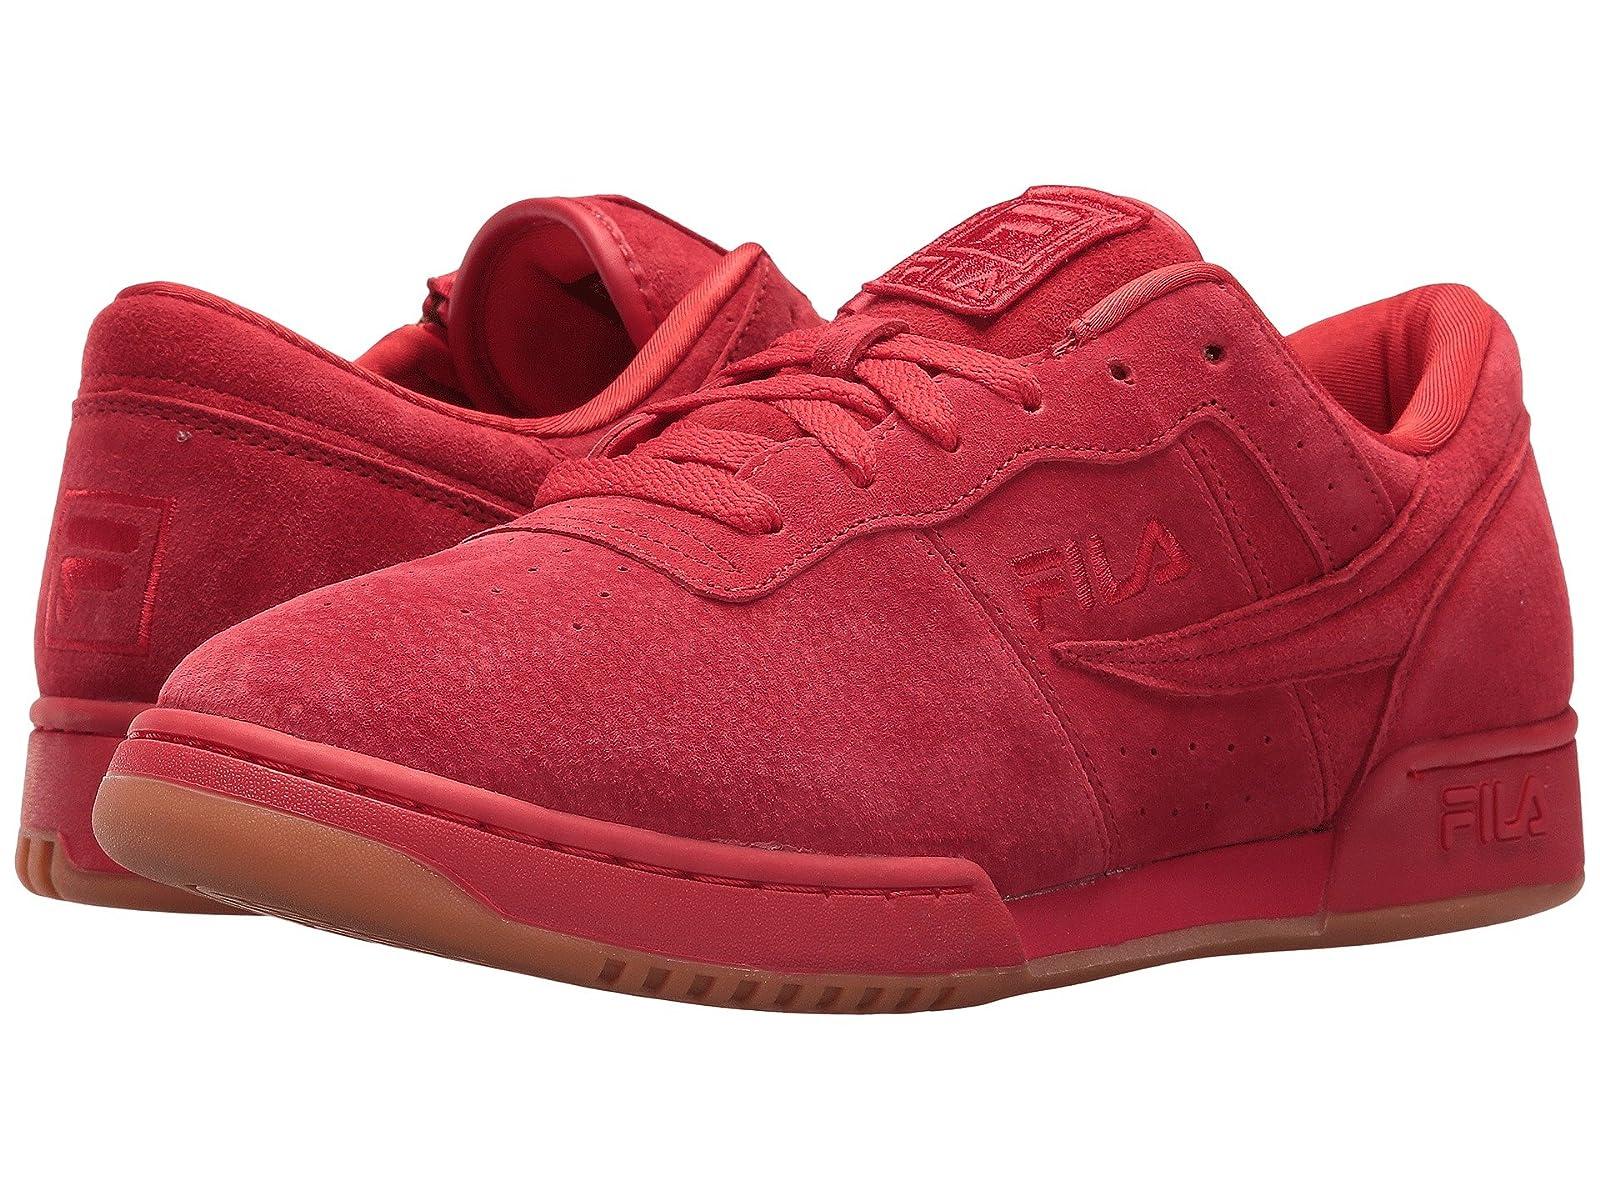 Fila Original Fitness ZipperAtmospheric grades have affordable shoes